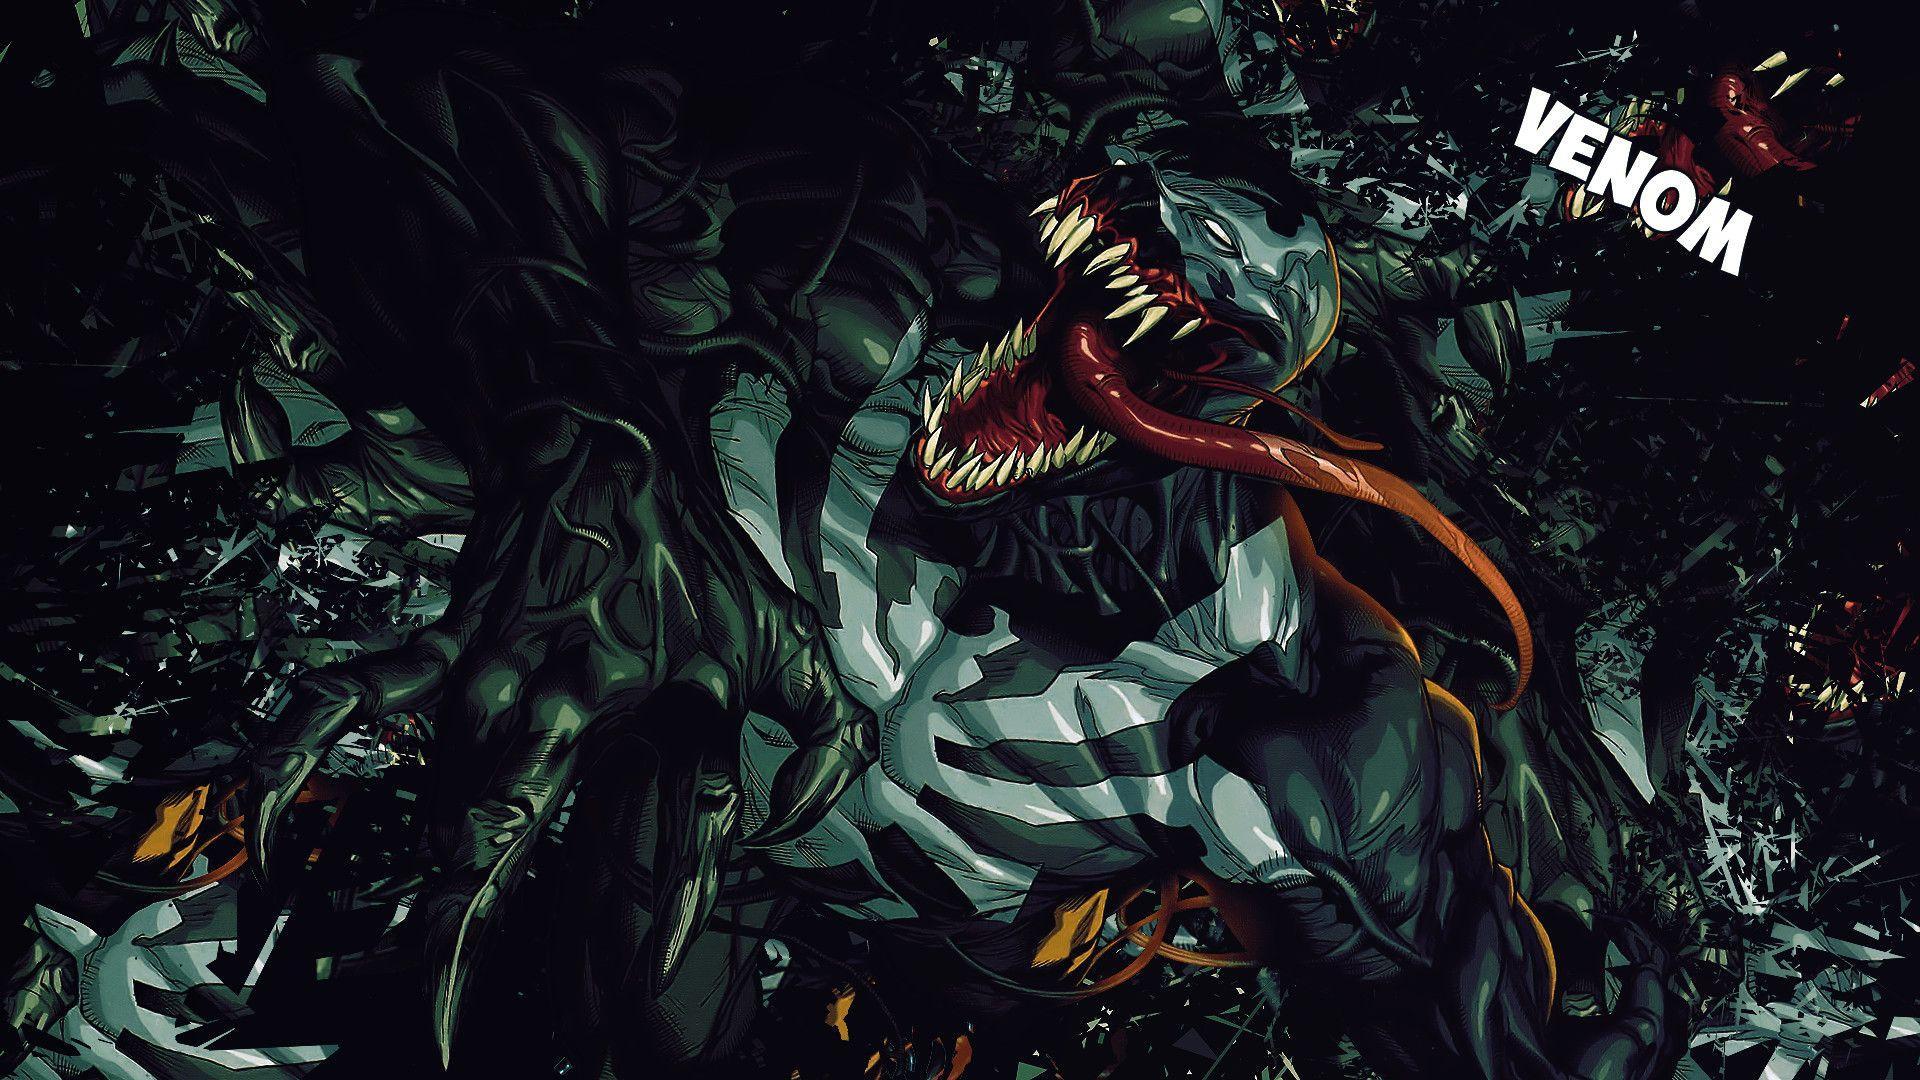 Carnage Vs Venom Wallpapers Hd Wallpaper Cave